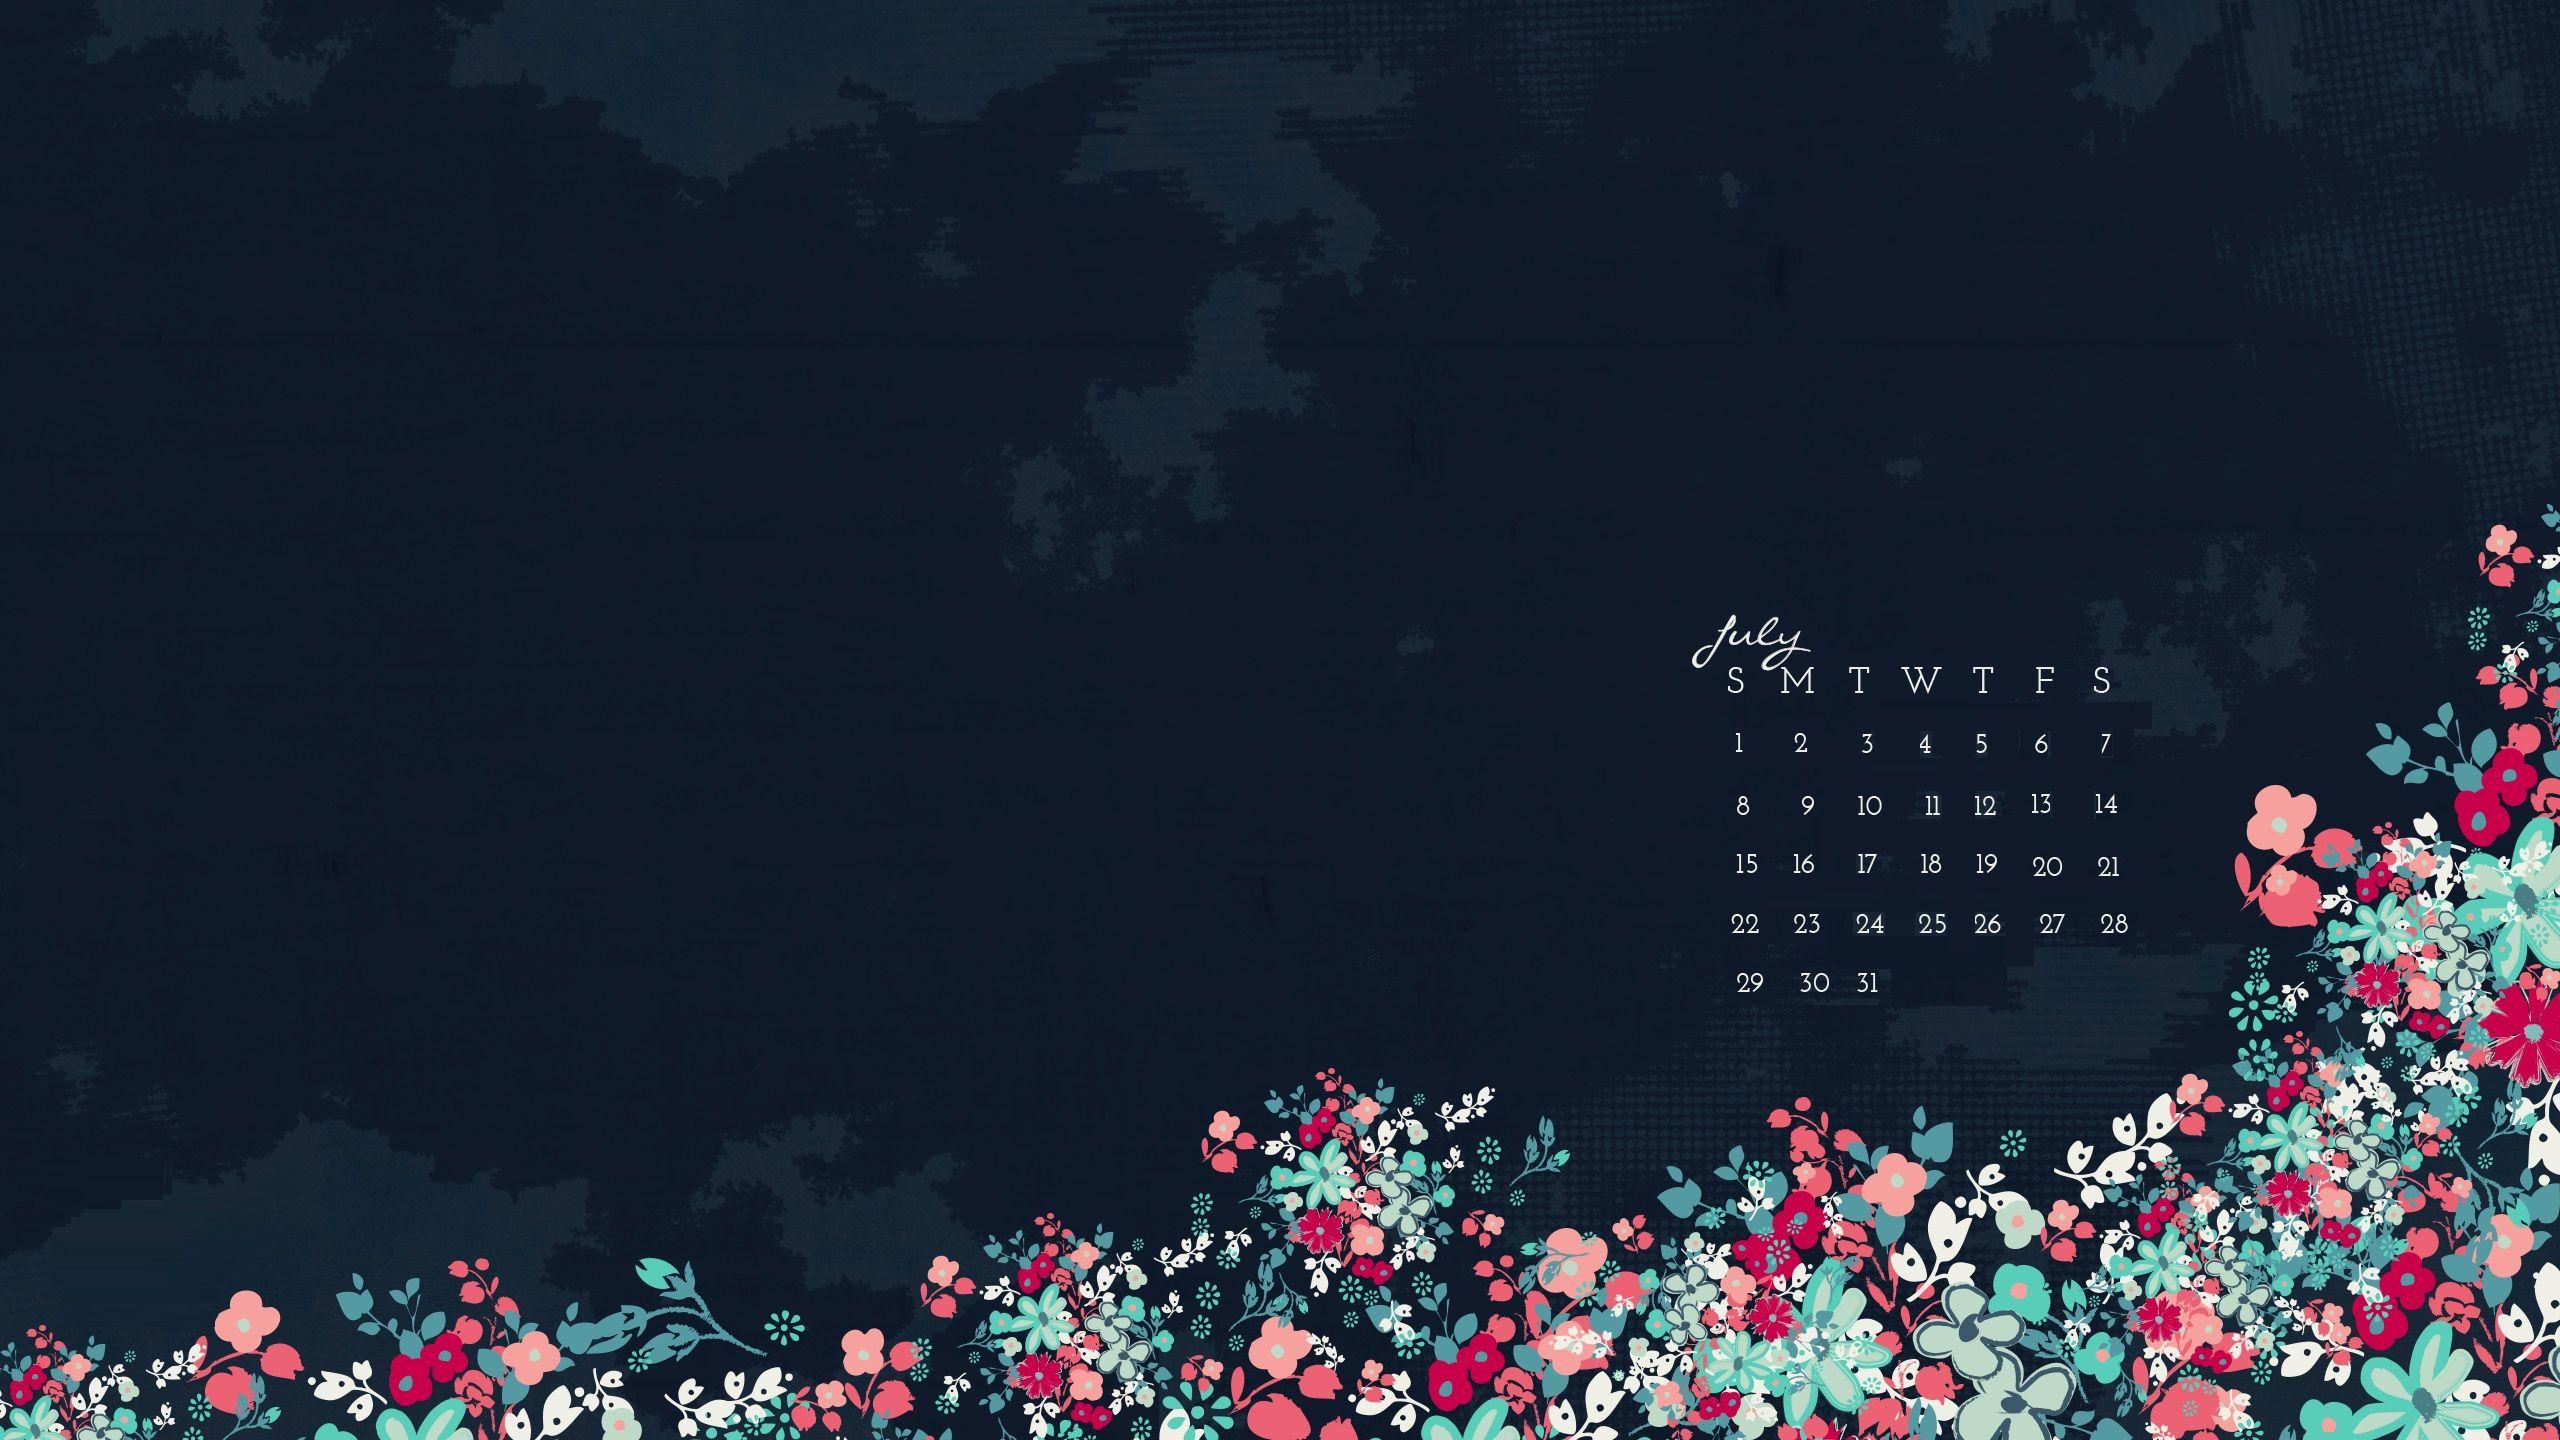 July 2018 Desktop Calendar Wallpapers Calendar Wallpaper Wallpaper Art Drawings Simple